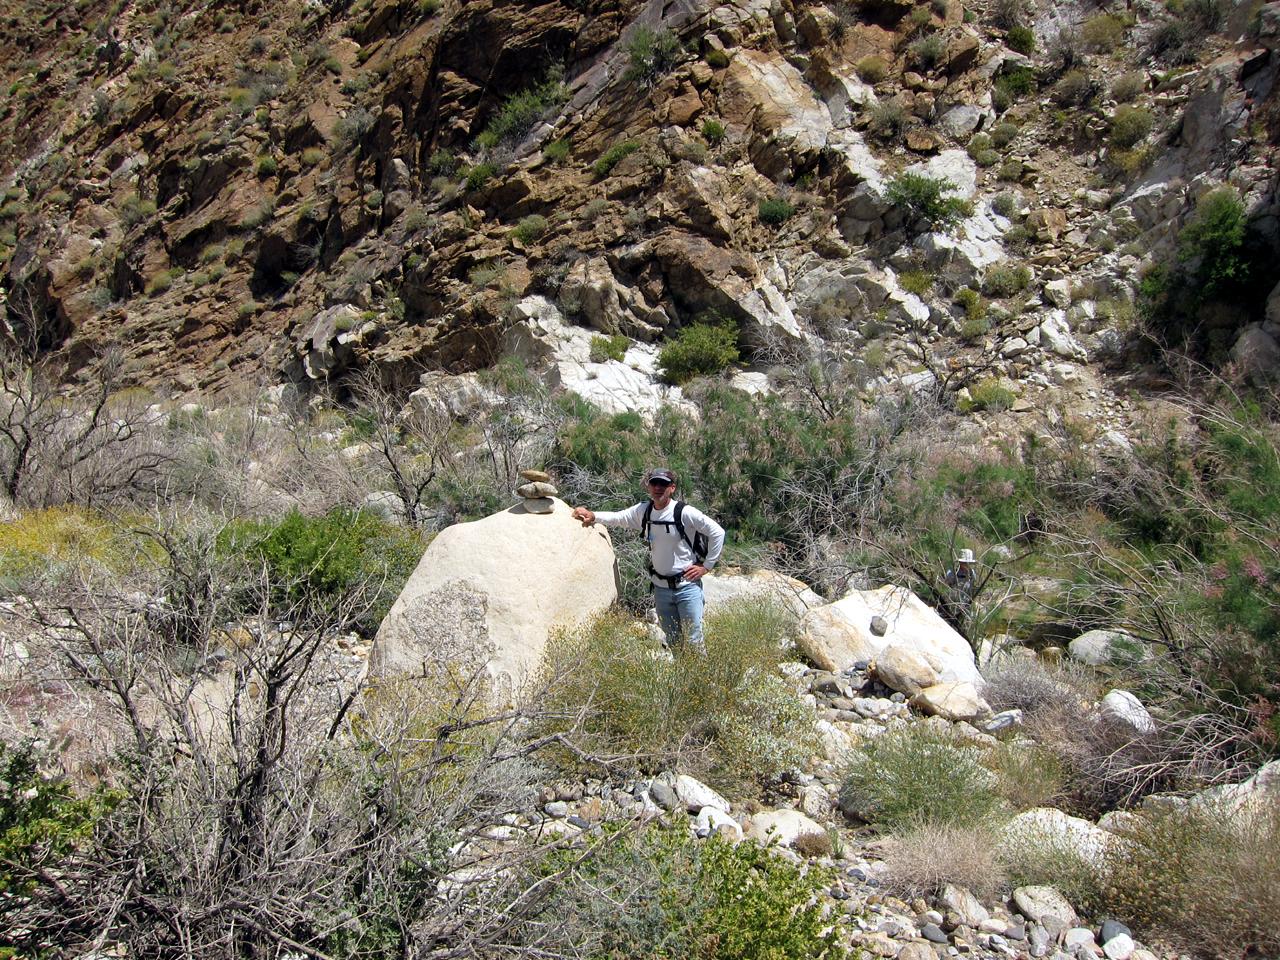 Daren sets a trail marker